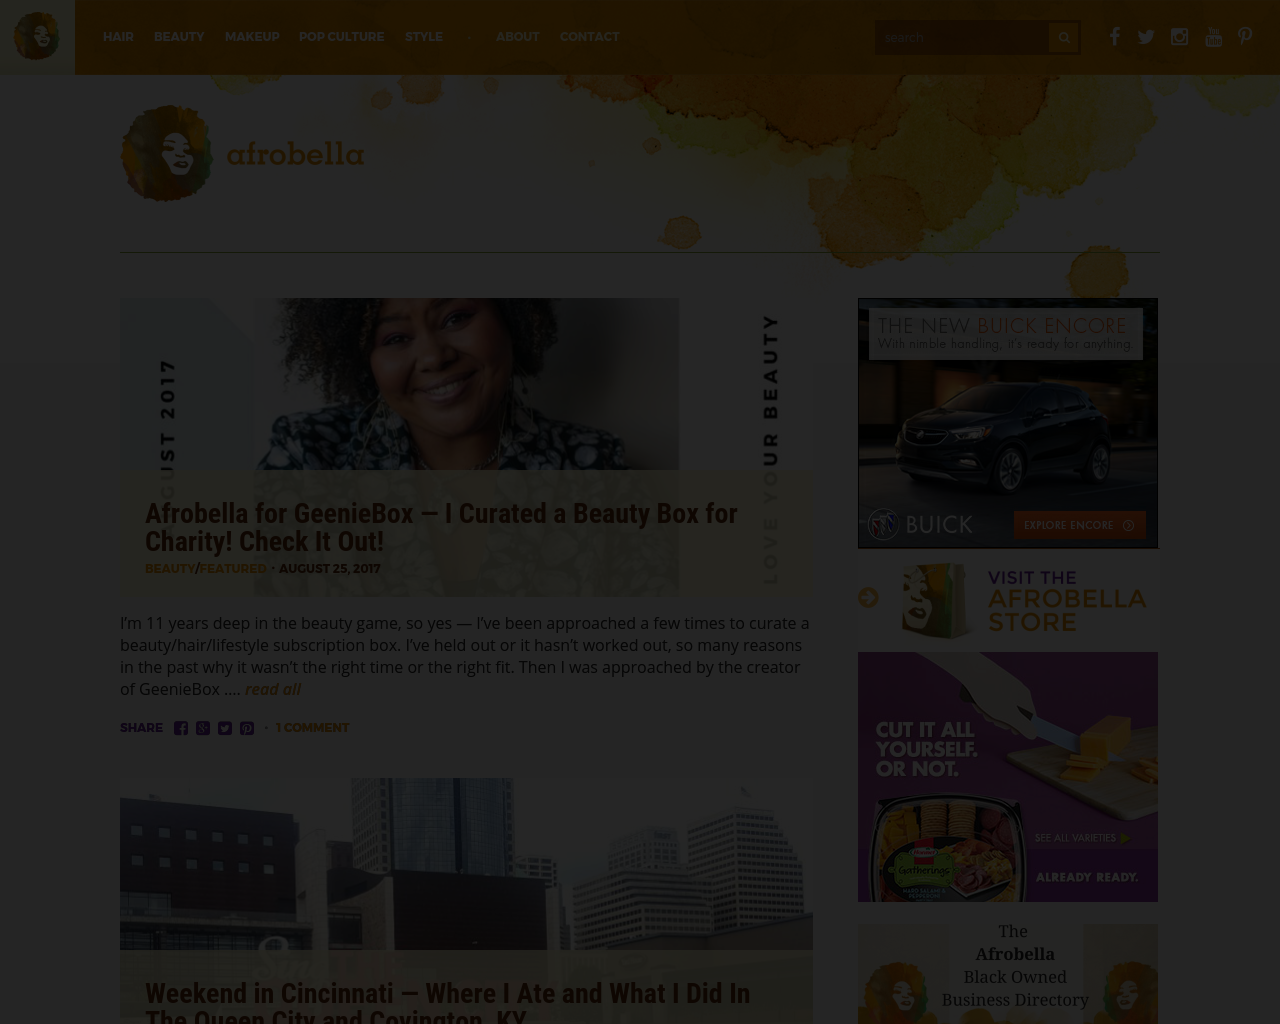 Afrobella-Advertising-Reviews-Pricing